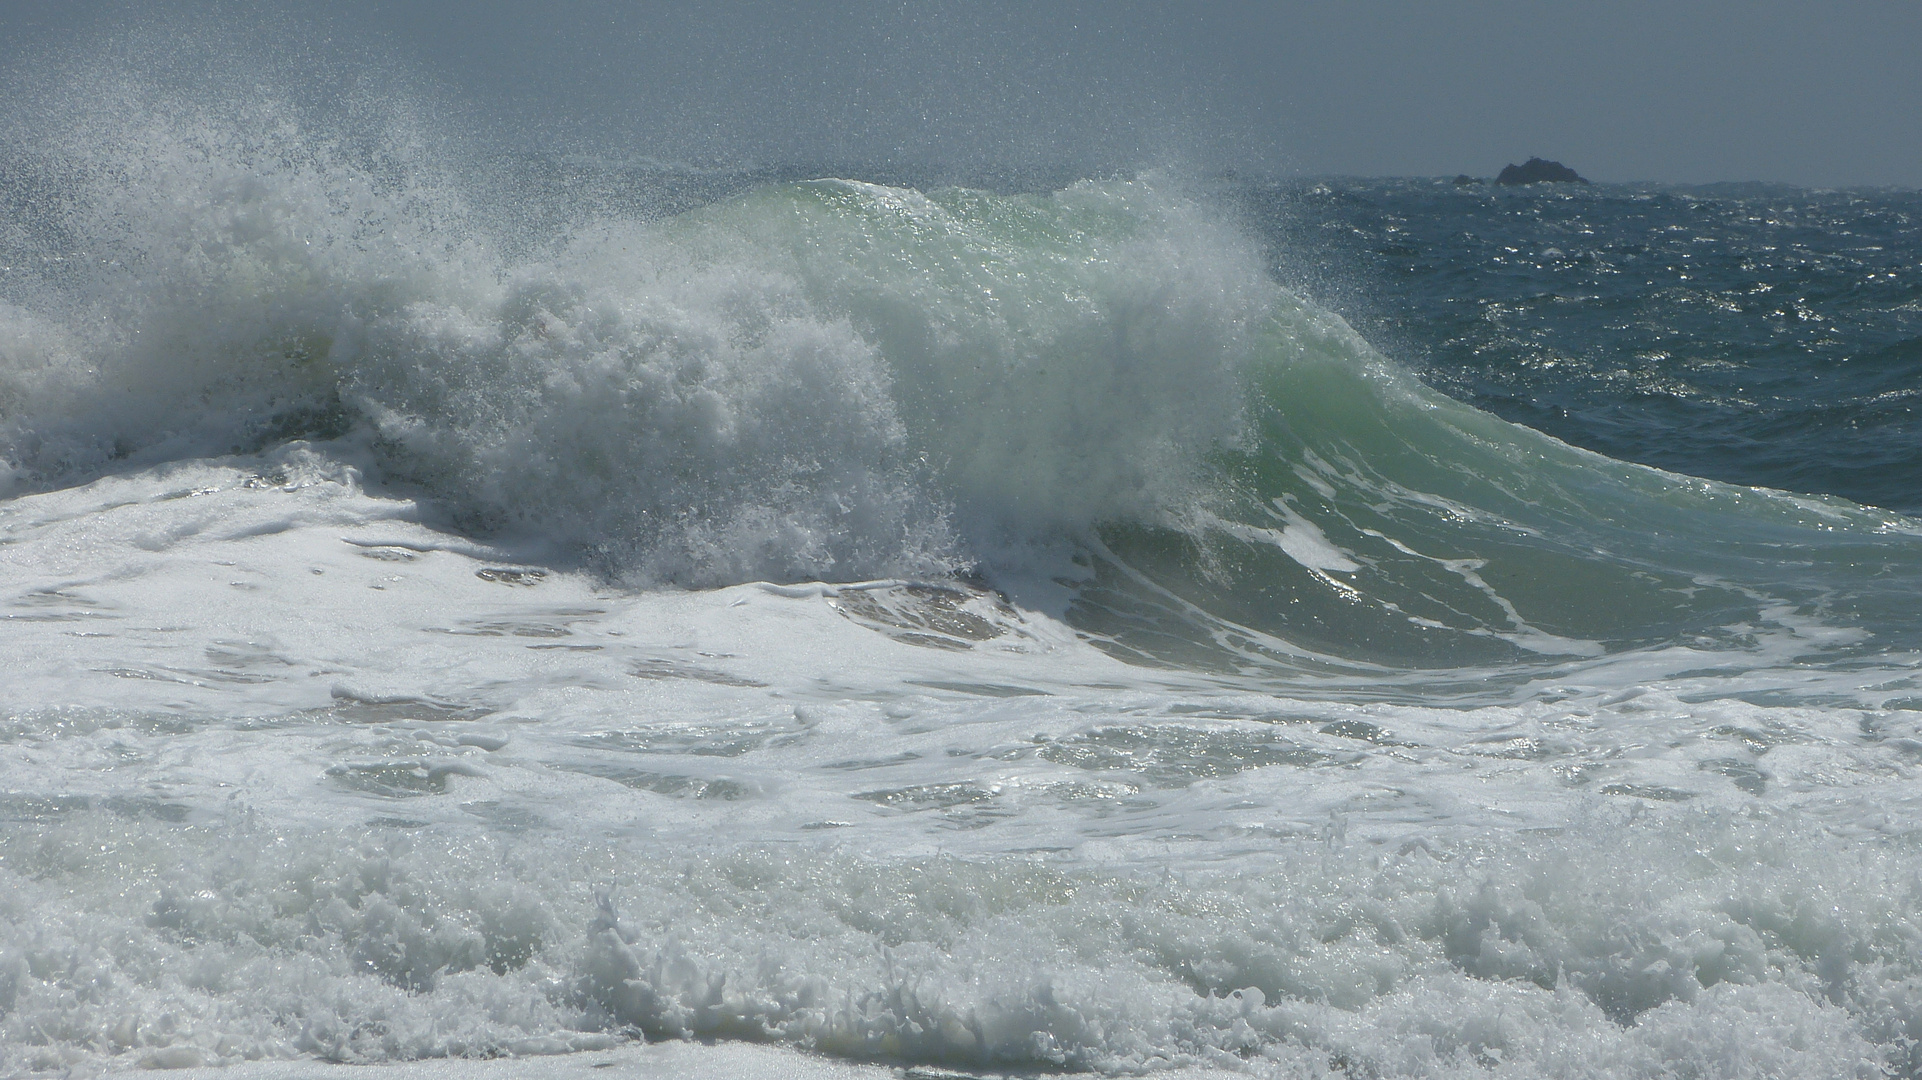 """The Wave"". Kynance Cove, Lizard Peninsula, Cornwall"